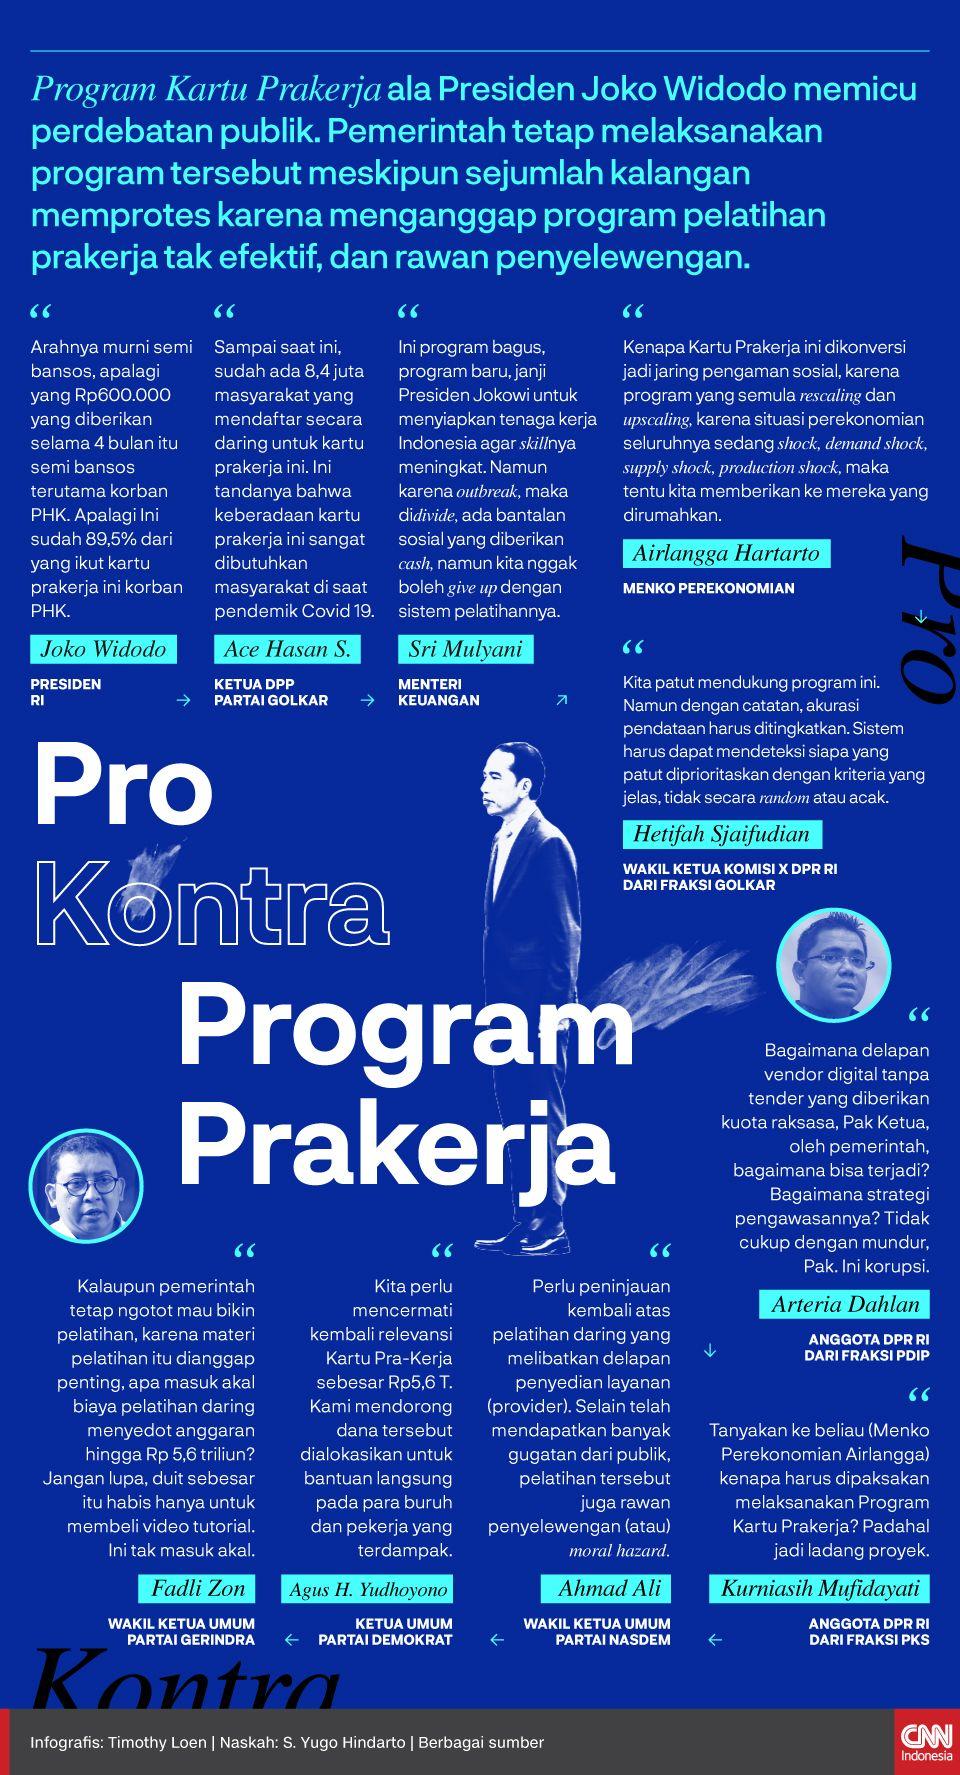 Infografis Pro Kontra Program Kartu Prakerja